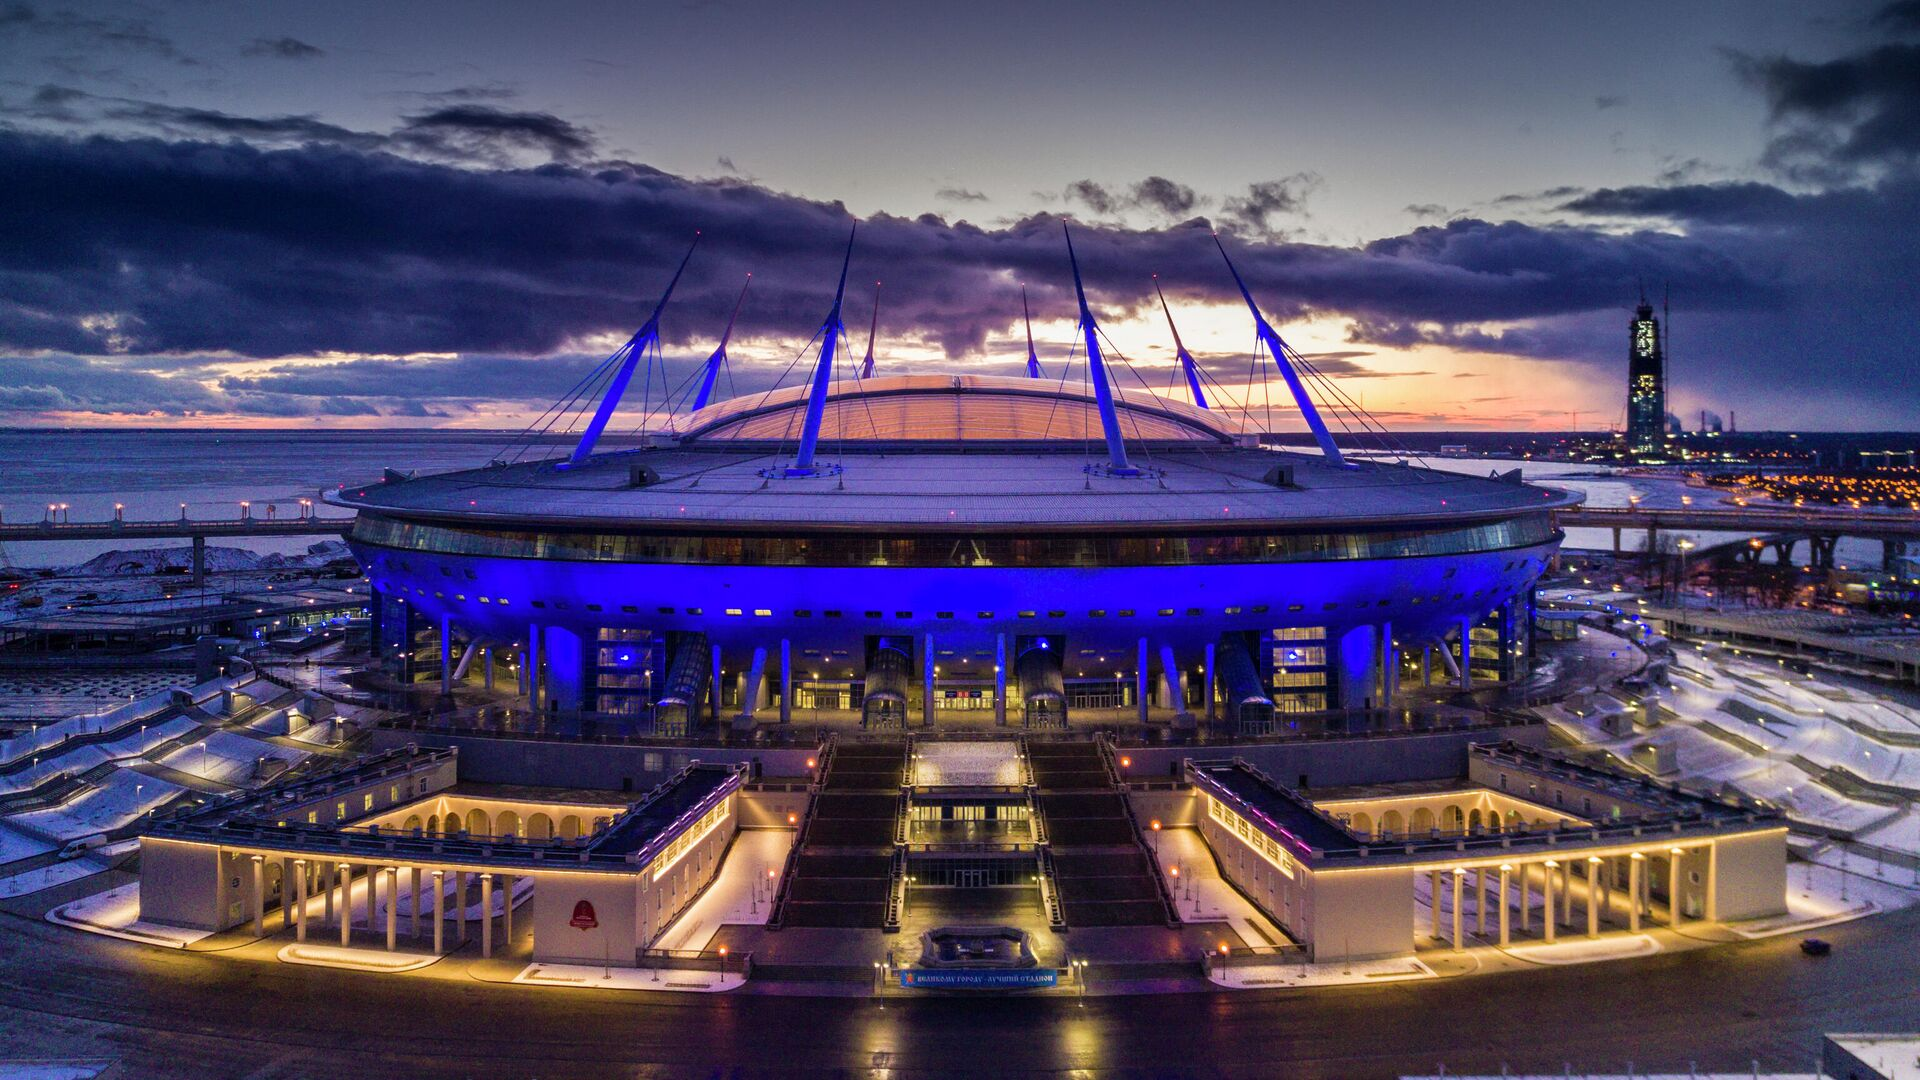 Стадион Санкт-Петербург Арена - РИА Новости, 1920, 08.12.2020